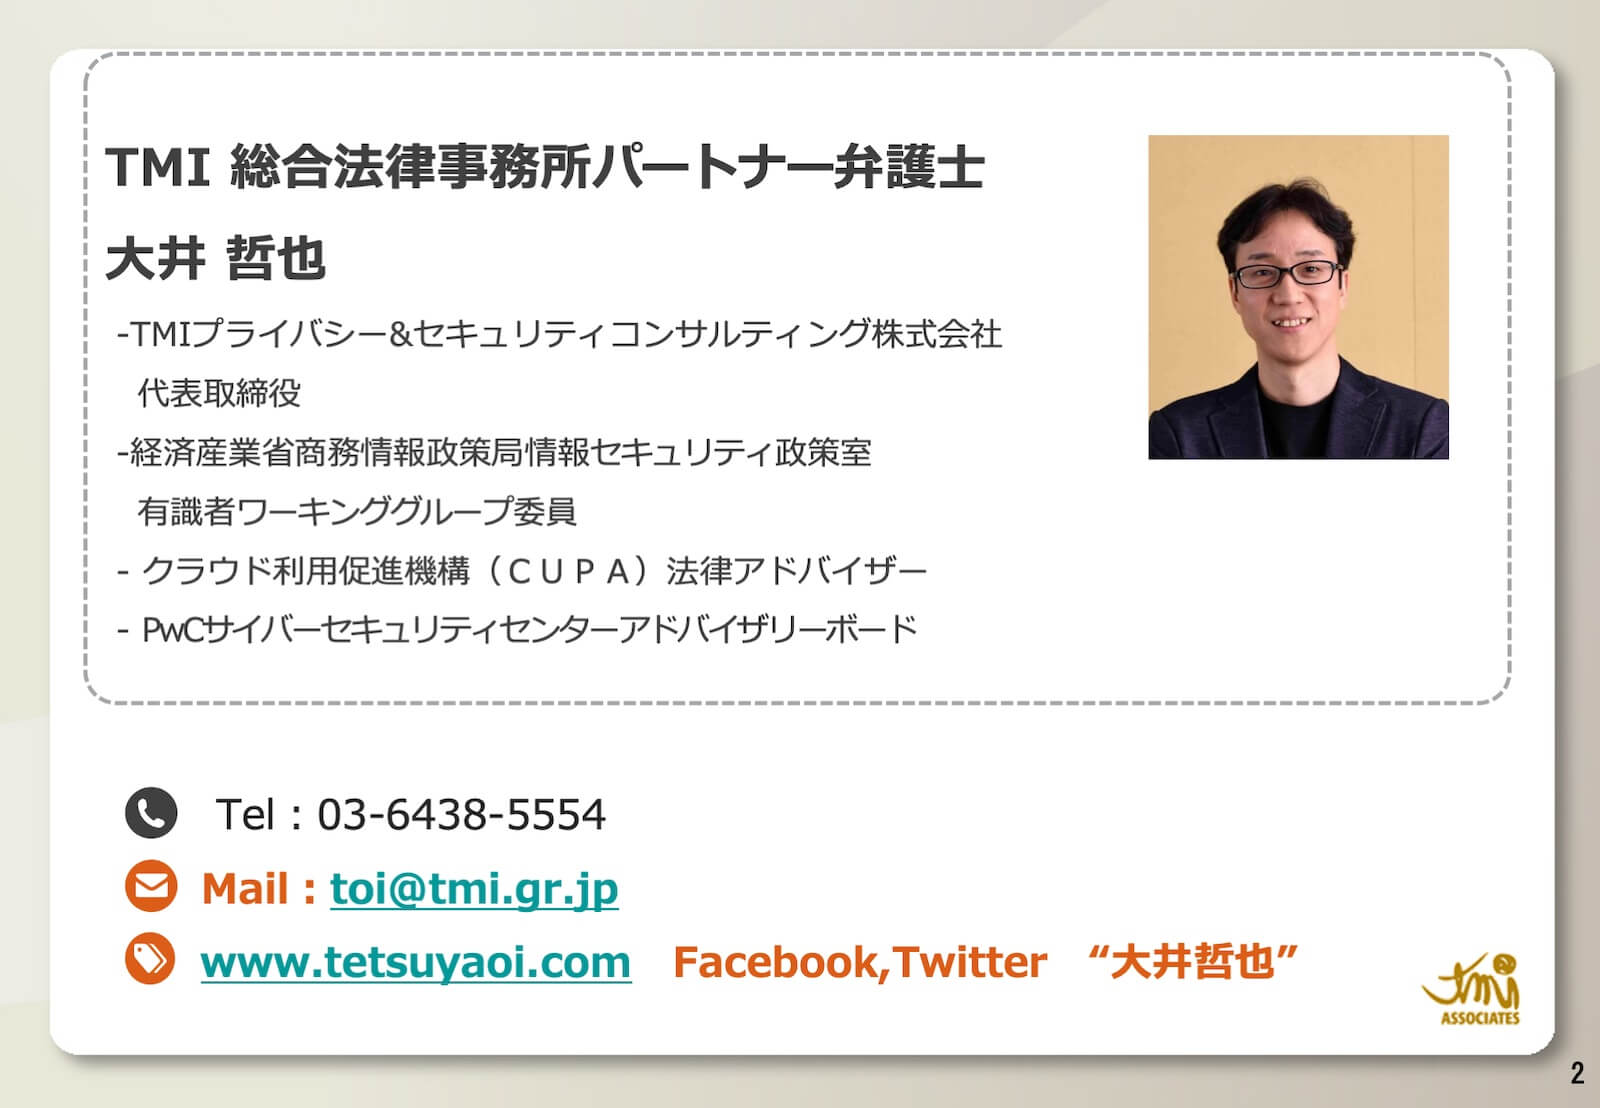 TMI総合法律事務所パートナー弁護士大井哲也